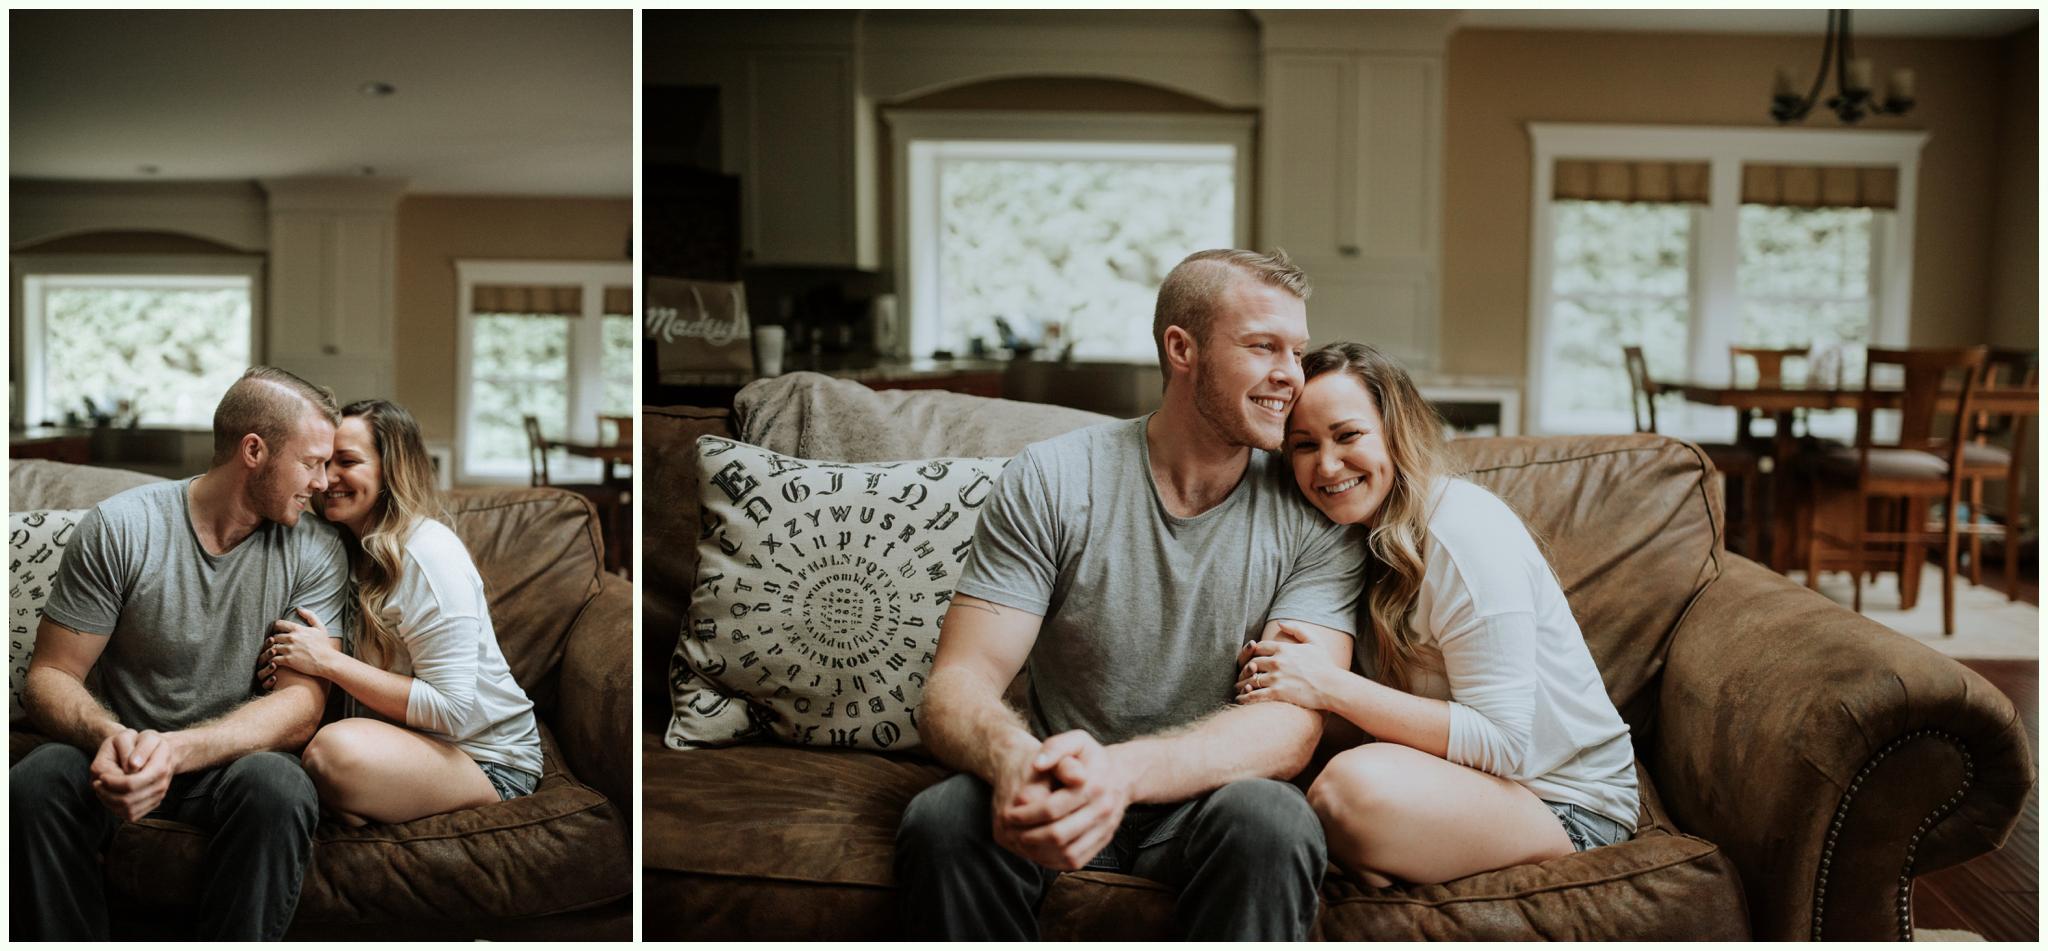 in-home-engagement-session-seattle-wedding-photographer-caitlyn-nikula-8.jpg